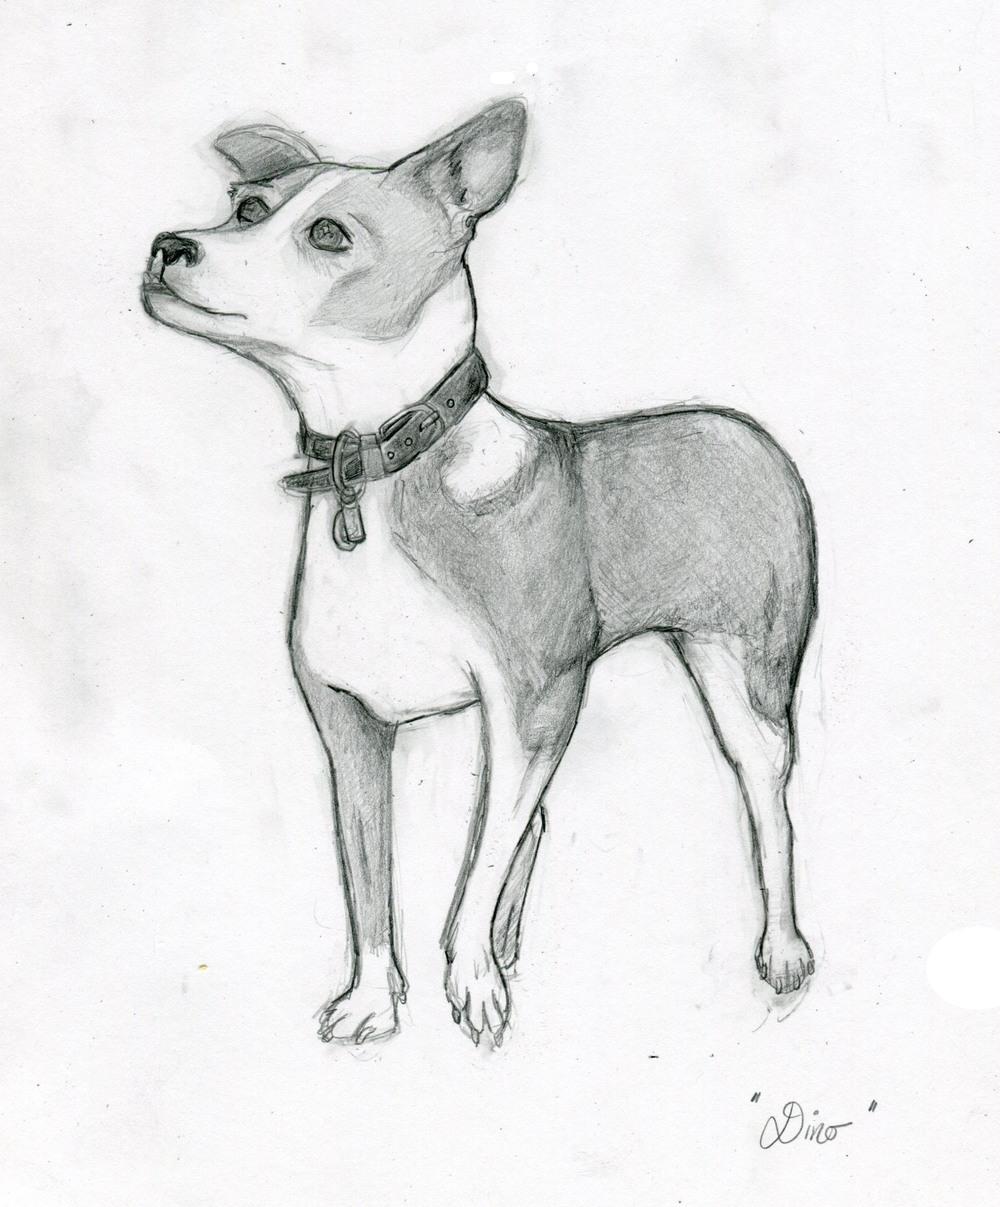 Dino(sketch), 2014 graphite on paper